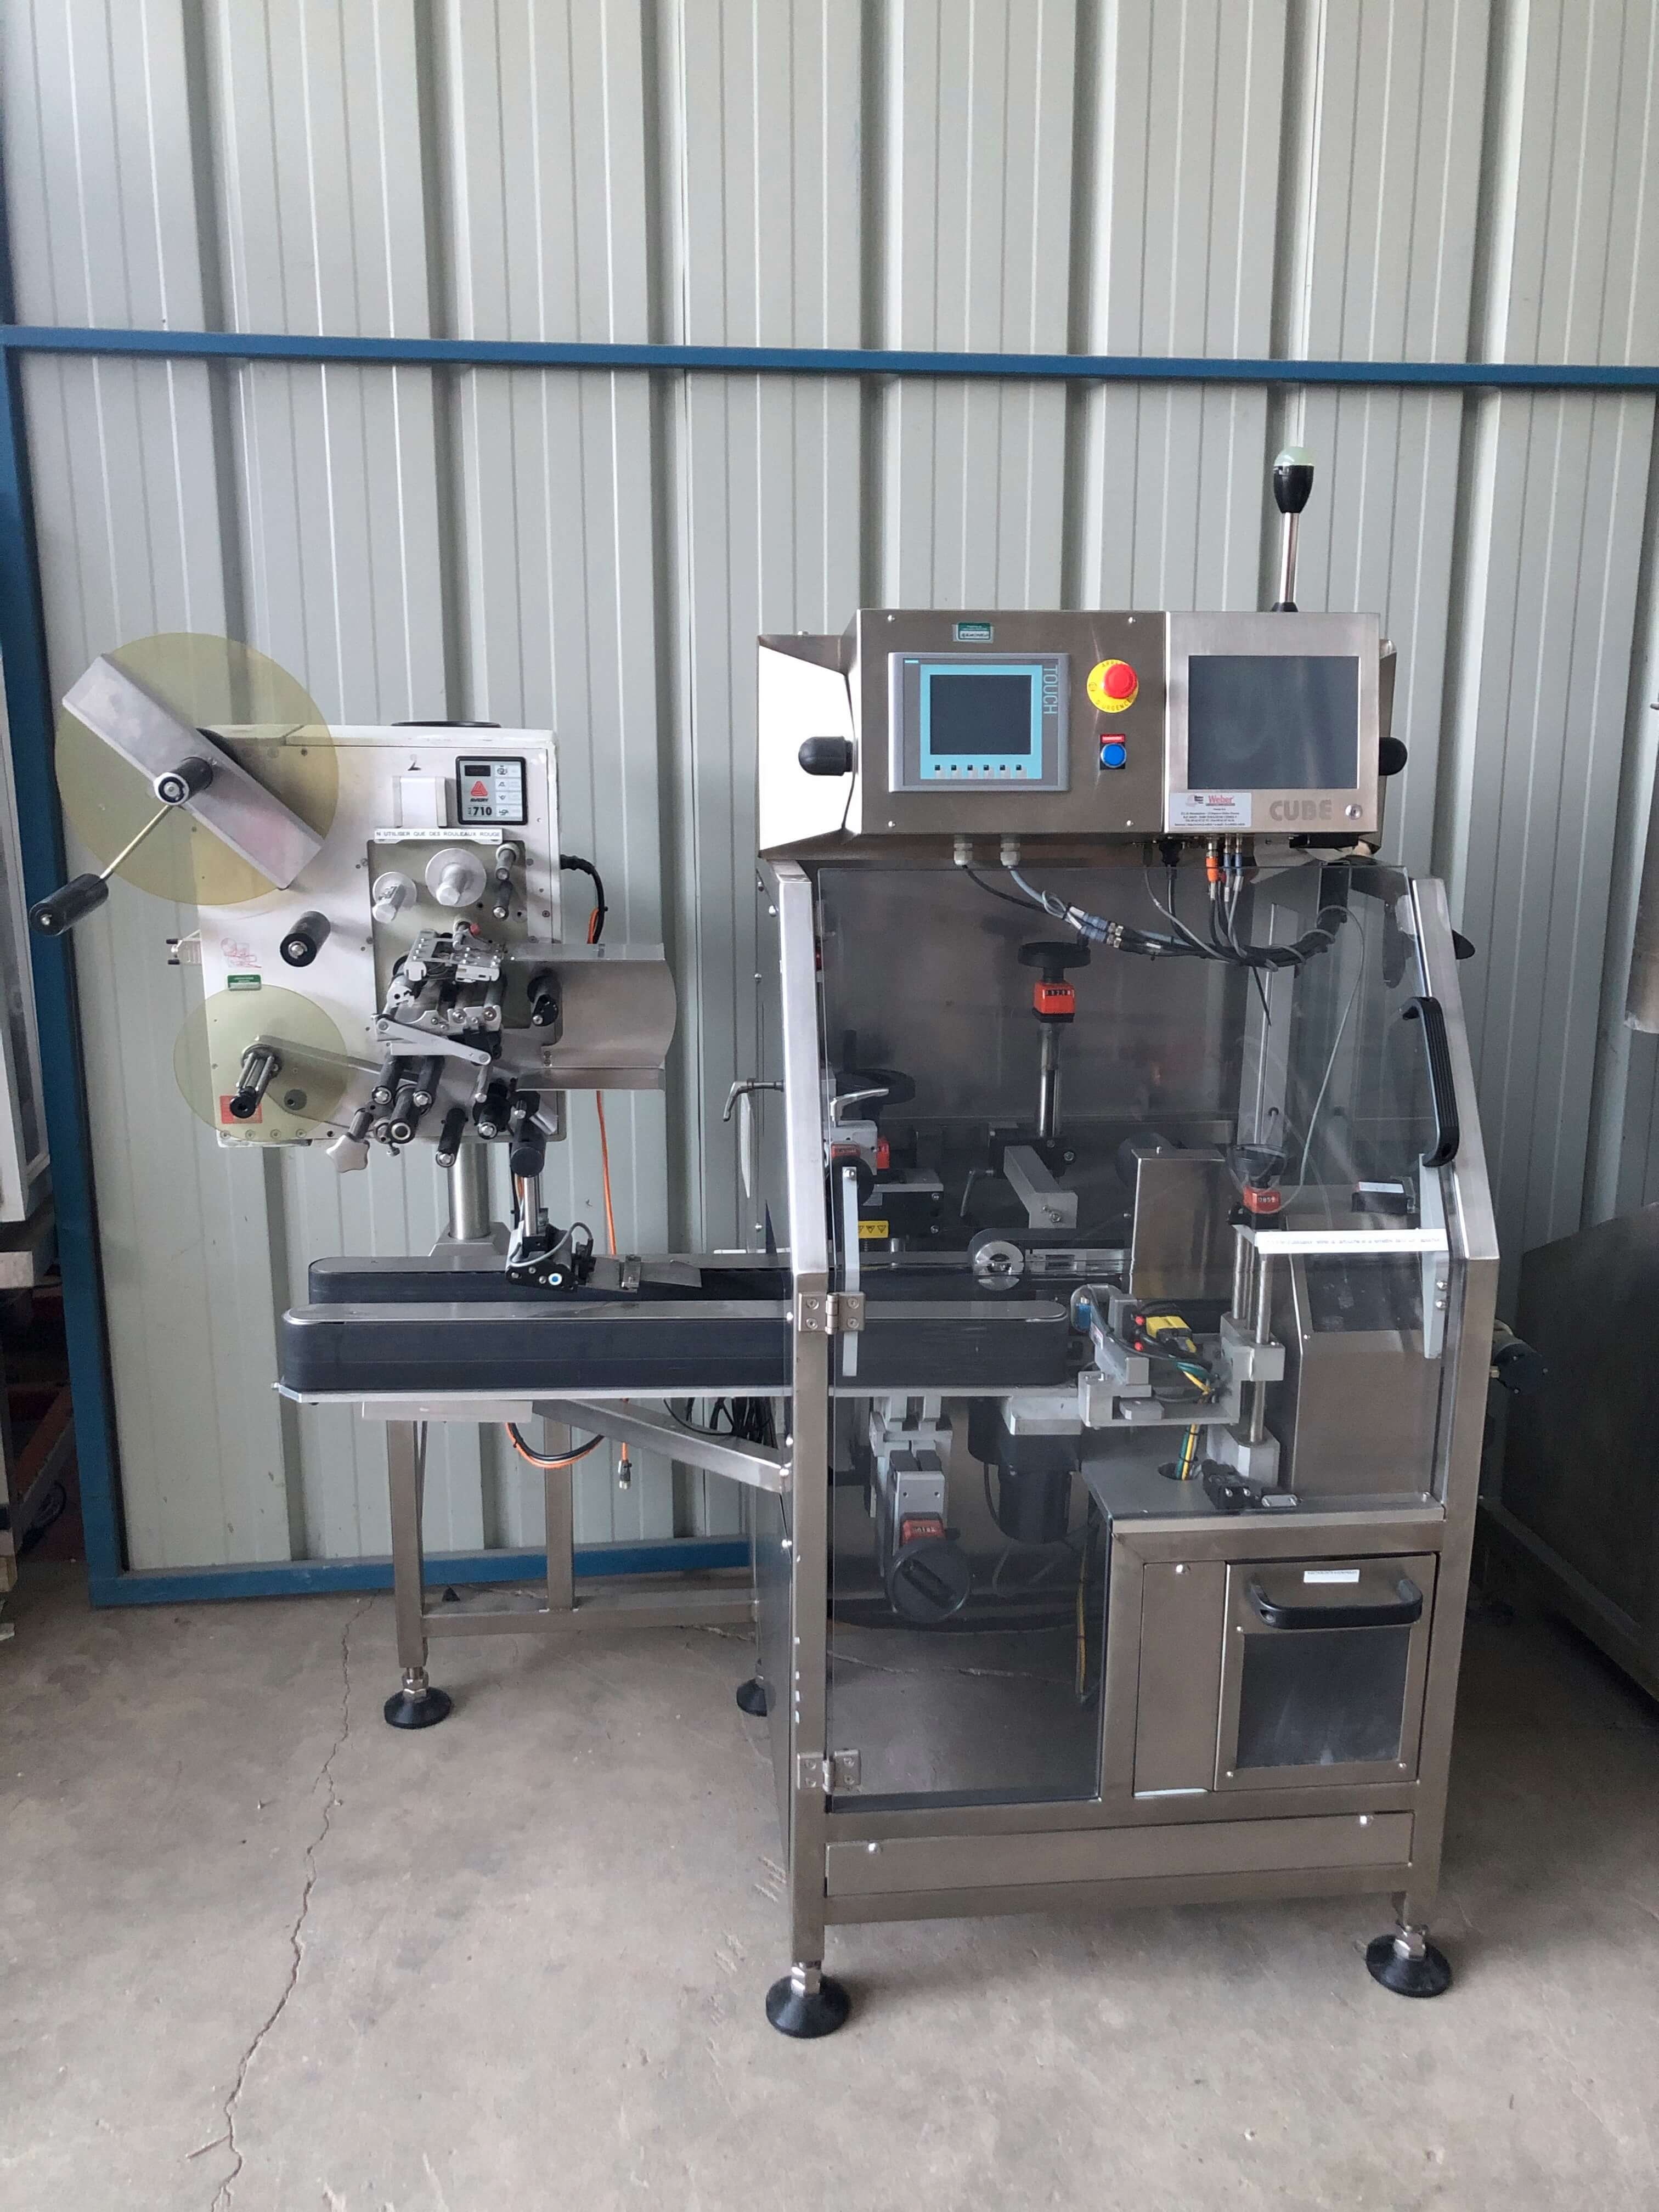 Transvis - Datamatrix printing and labelling unit